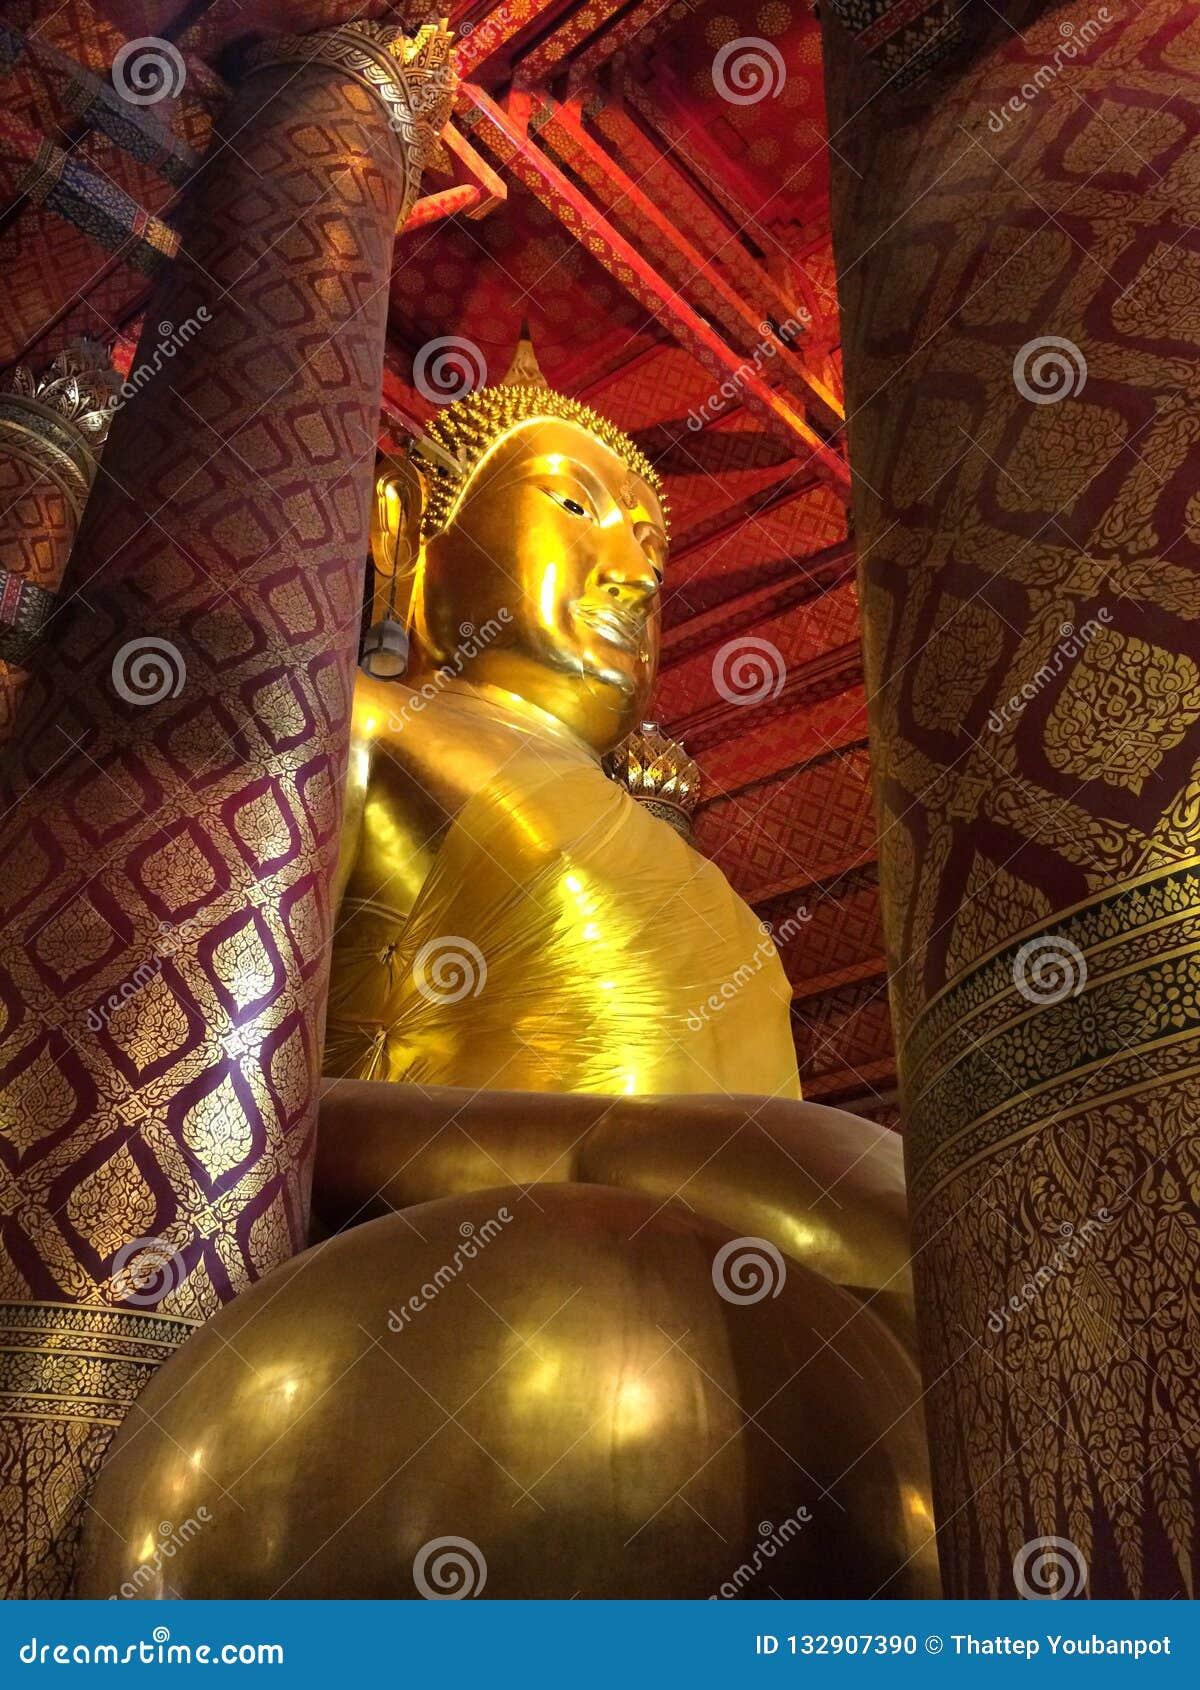 Big Buddha statue at Wat Phanan Choeng temple